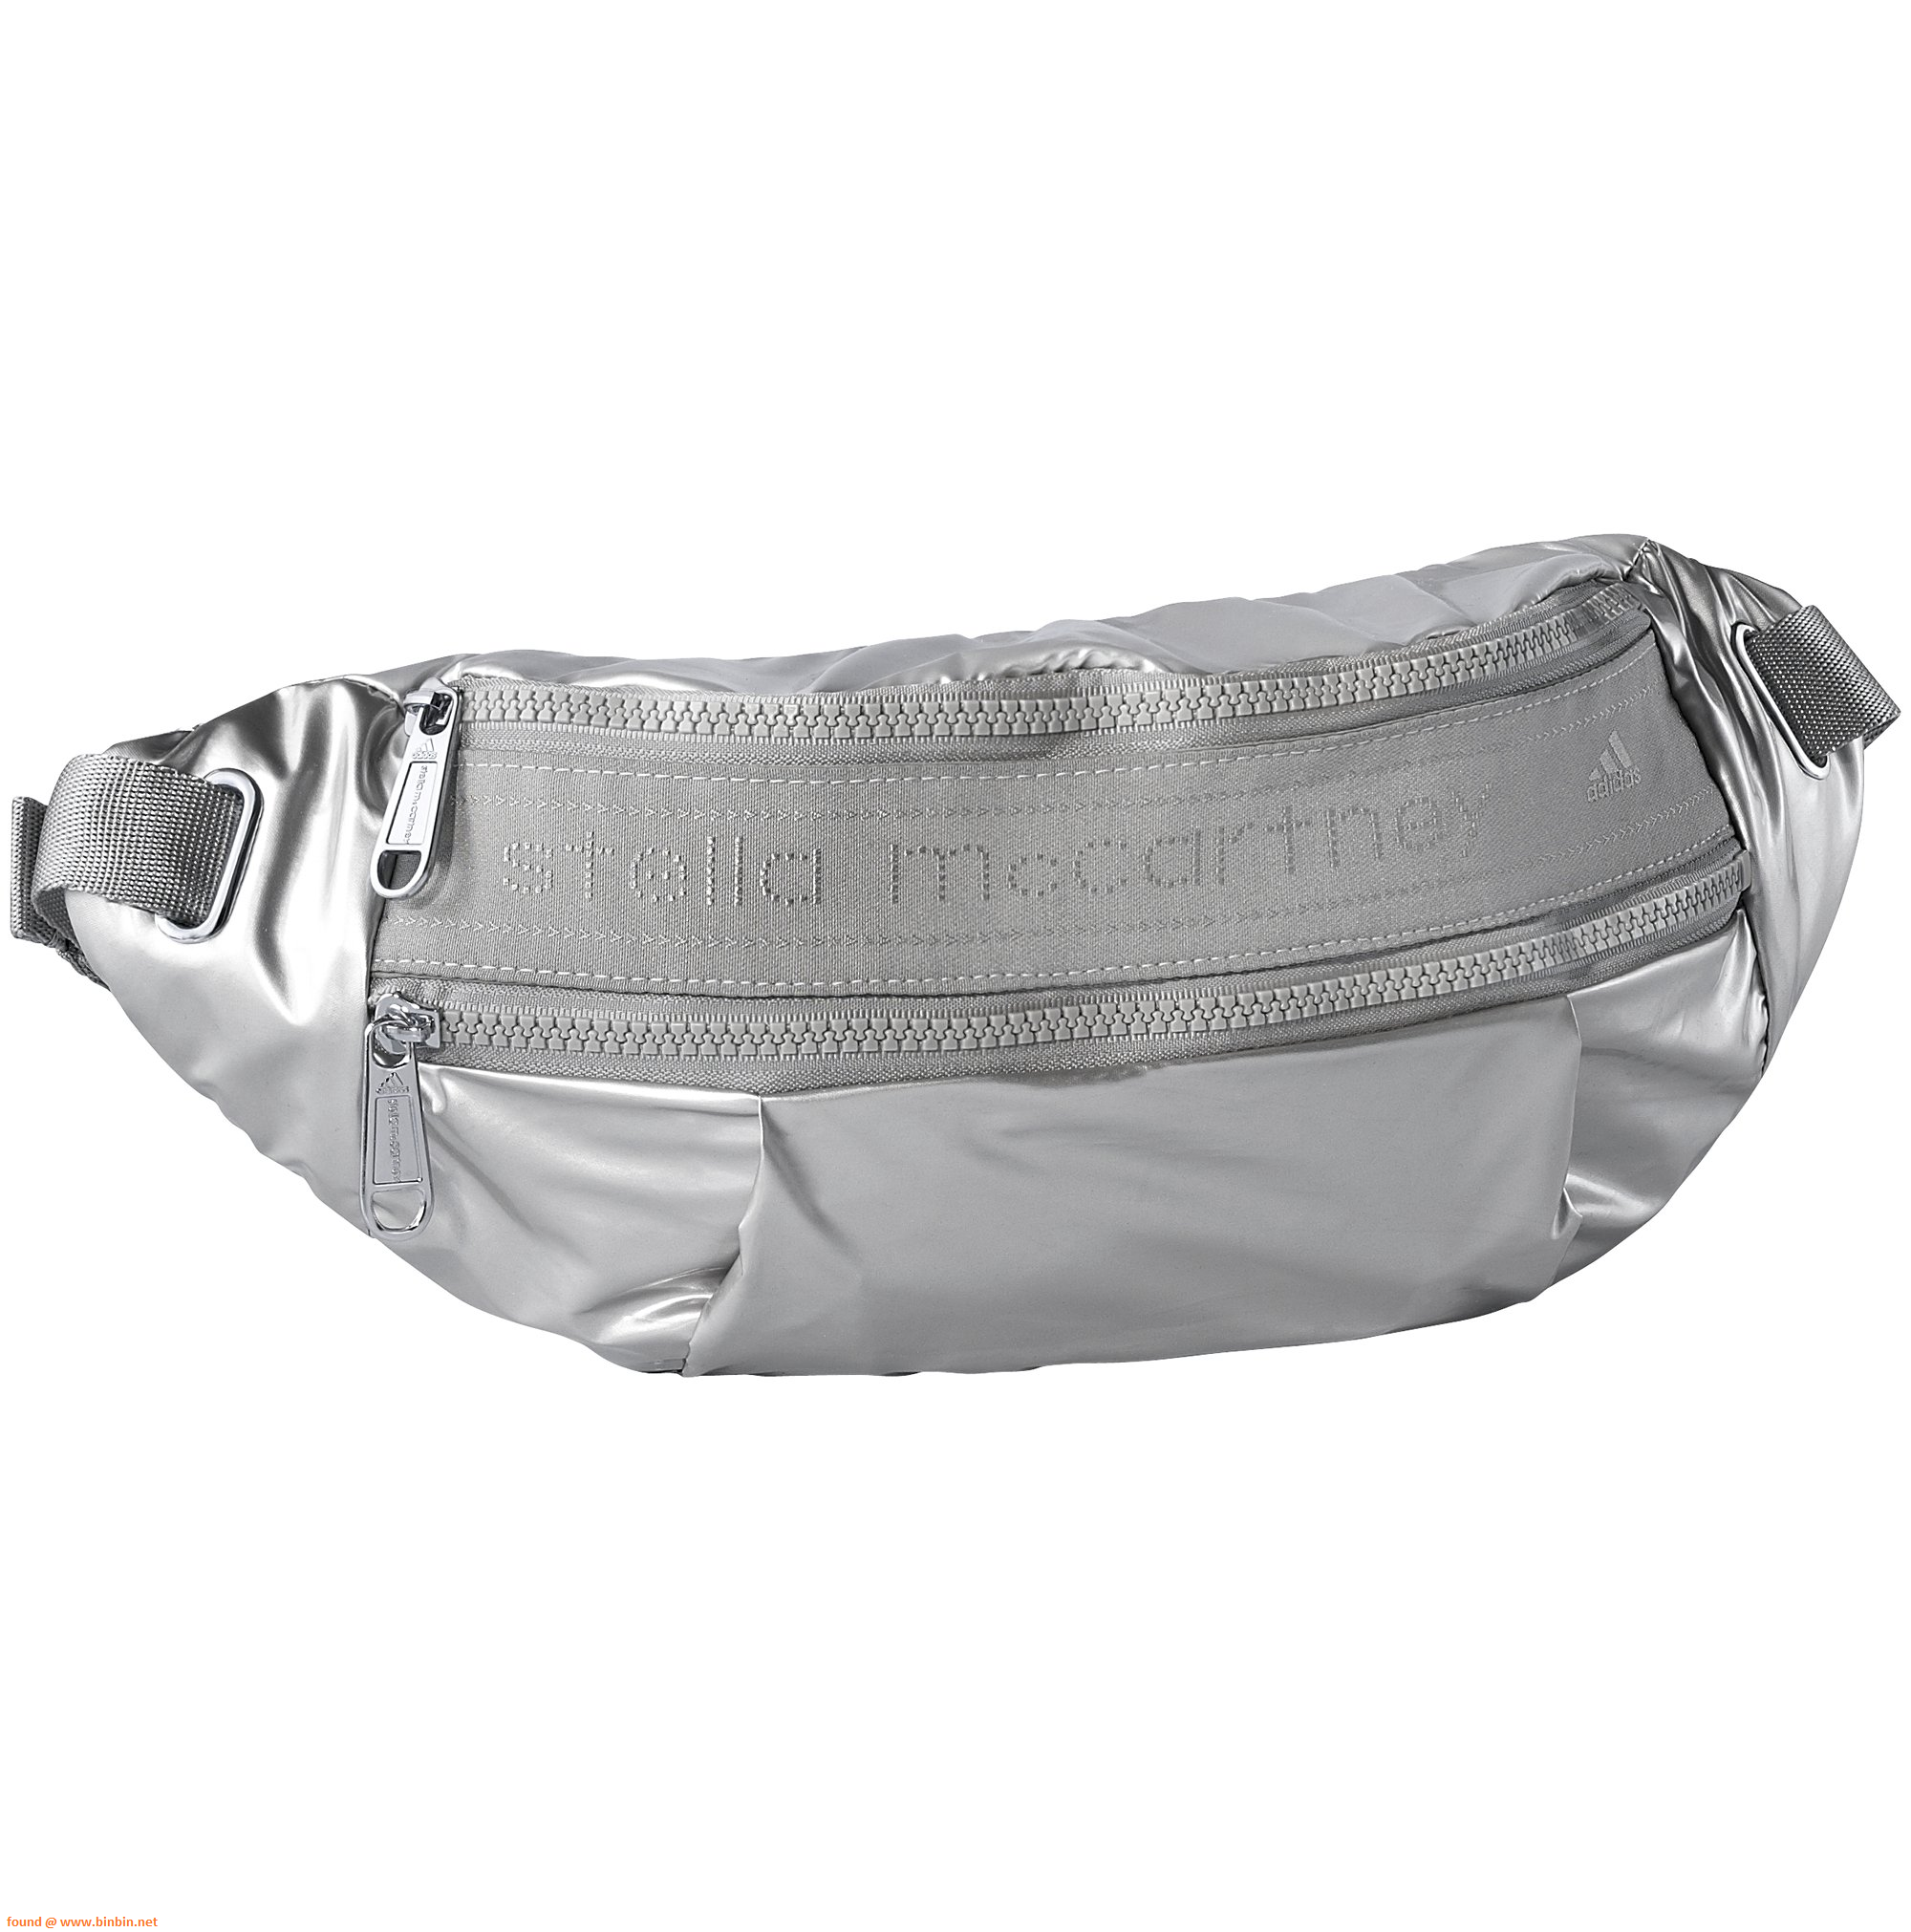 1639045c2c2e stella mccartney waist pack - Google Search